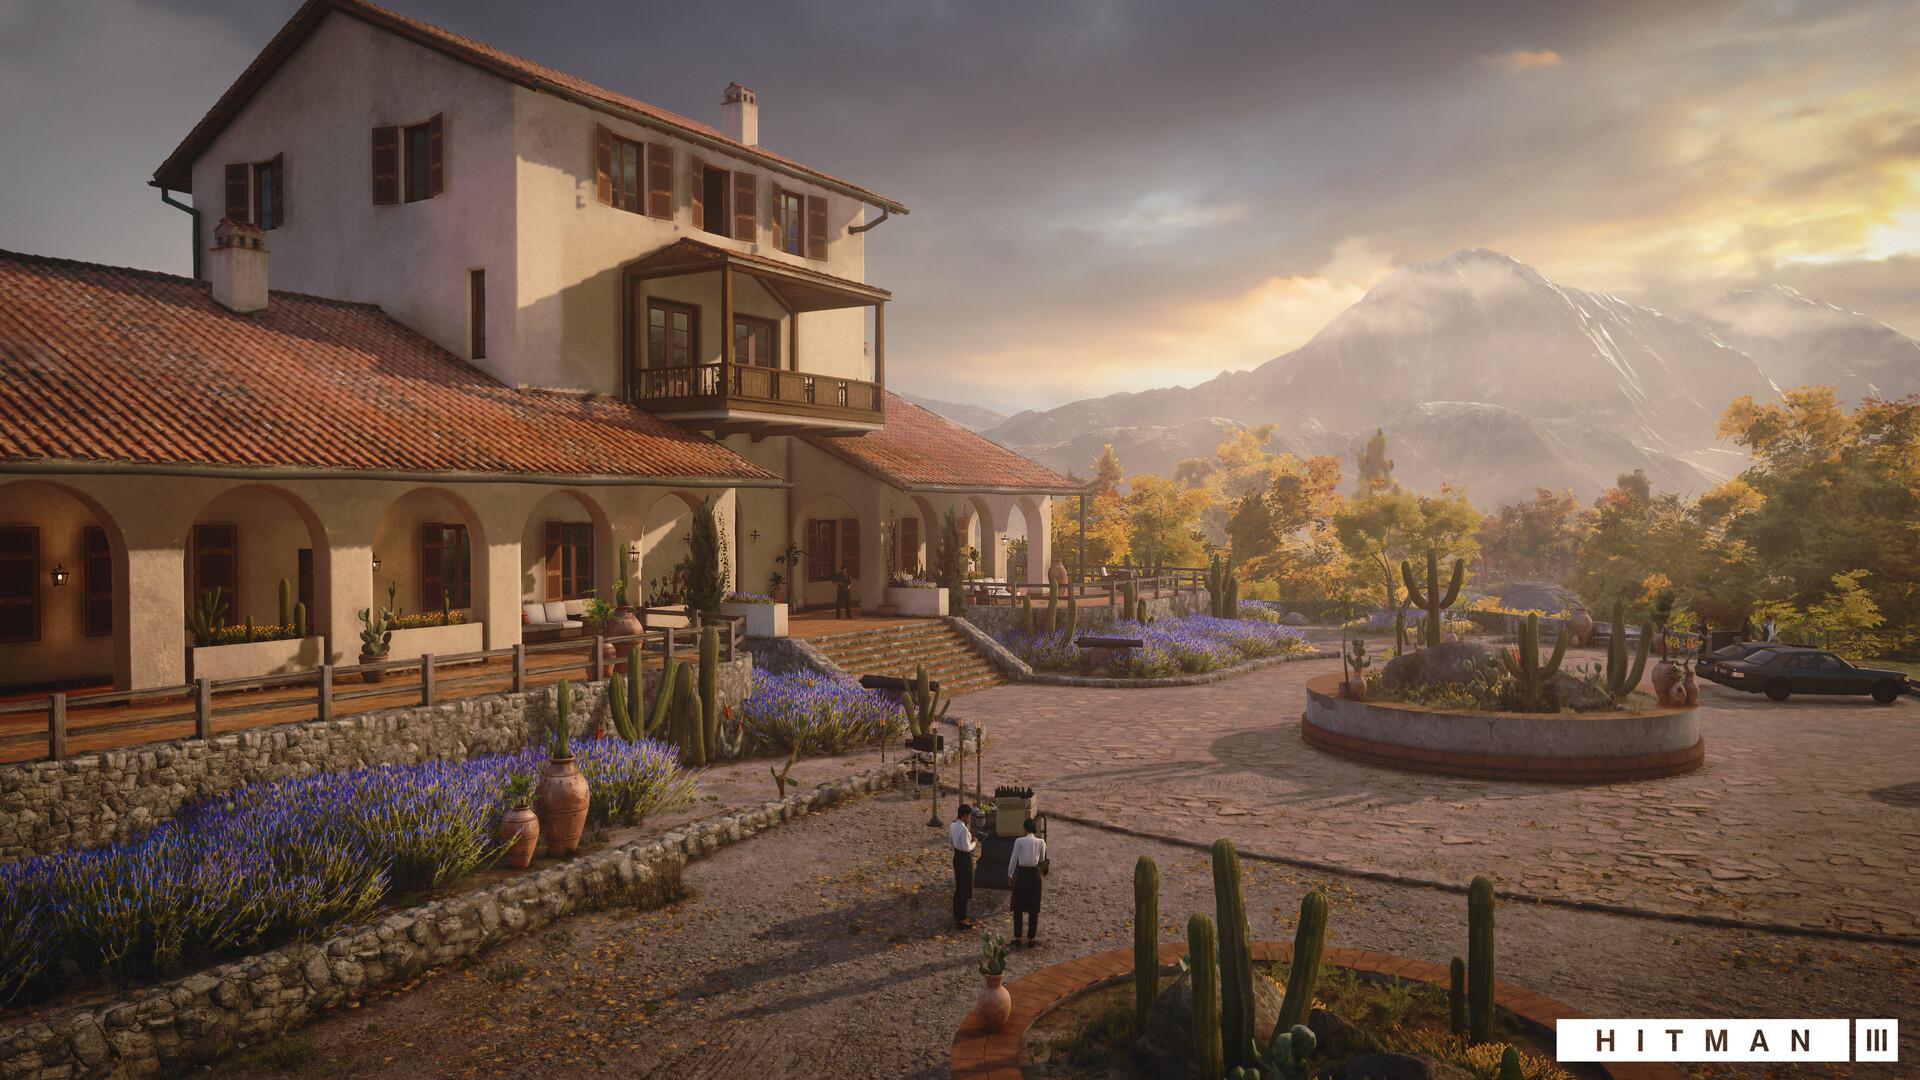 Quelle: ArtStation - Hitman 3: Mendoza (2021) - Villa